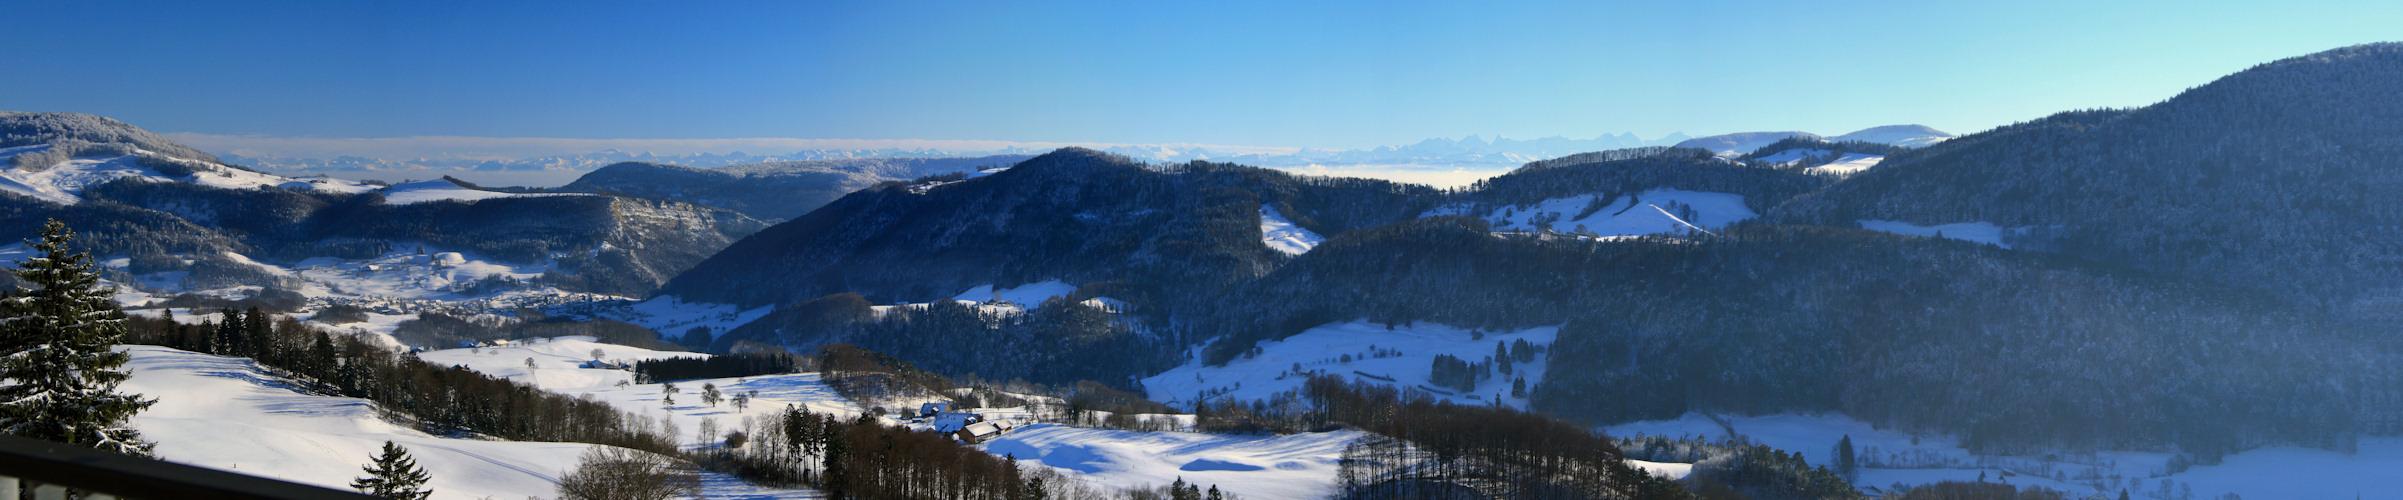 Blick in die Alpen 2